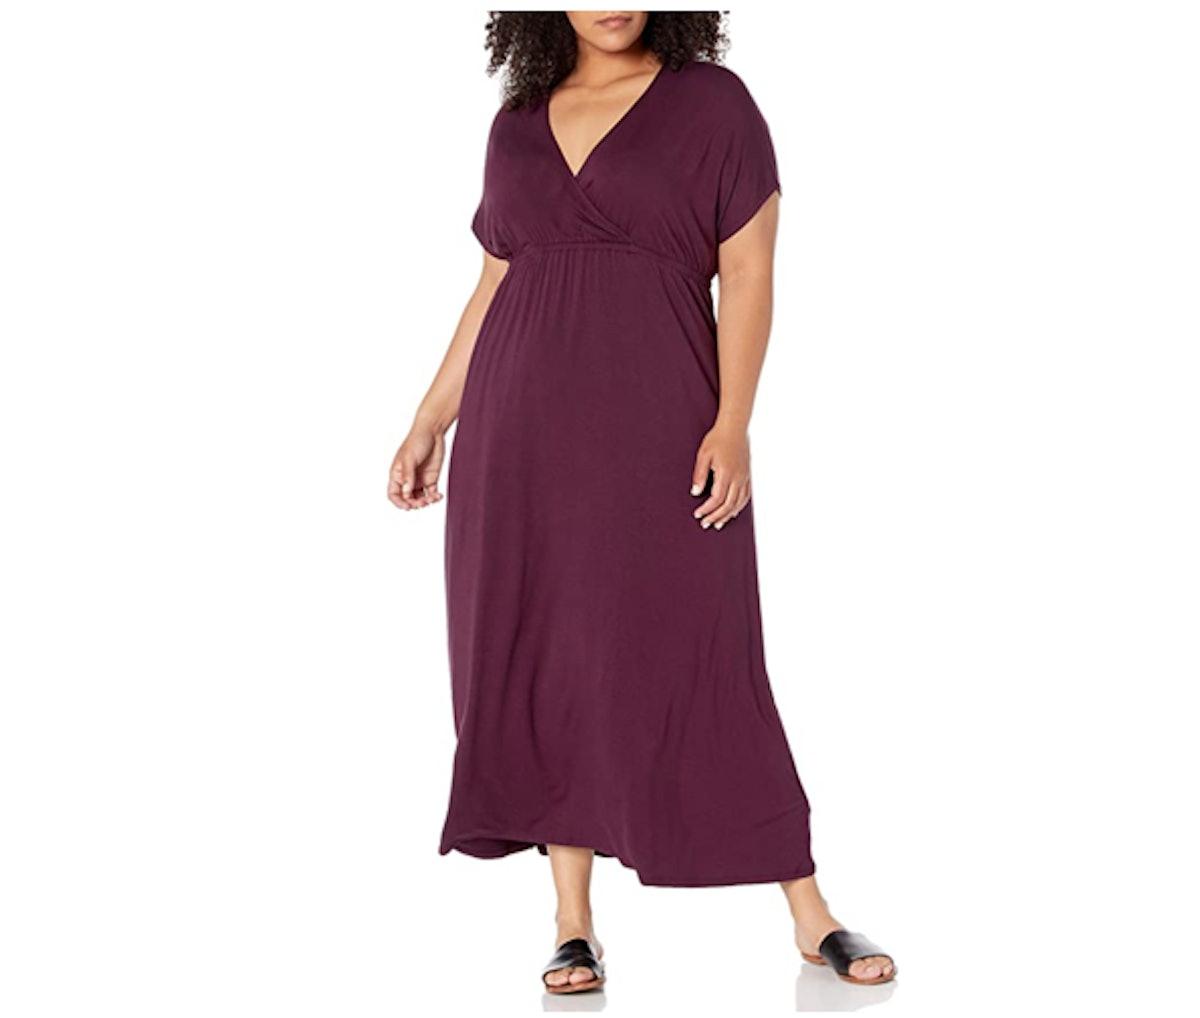 Amazon Essentials Plus Size Maxi Dress